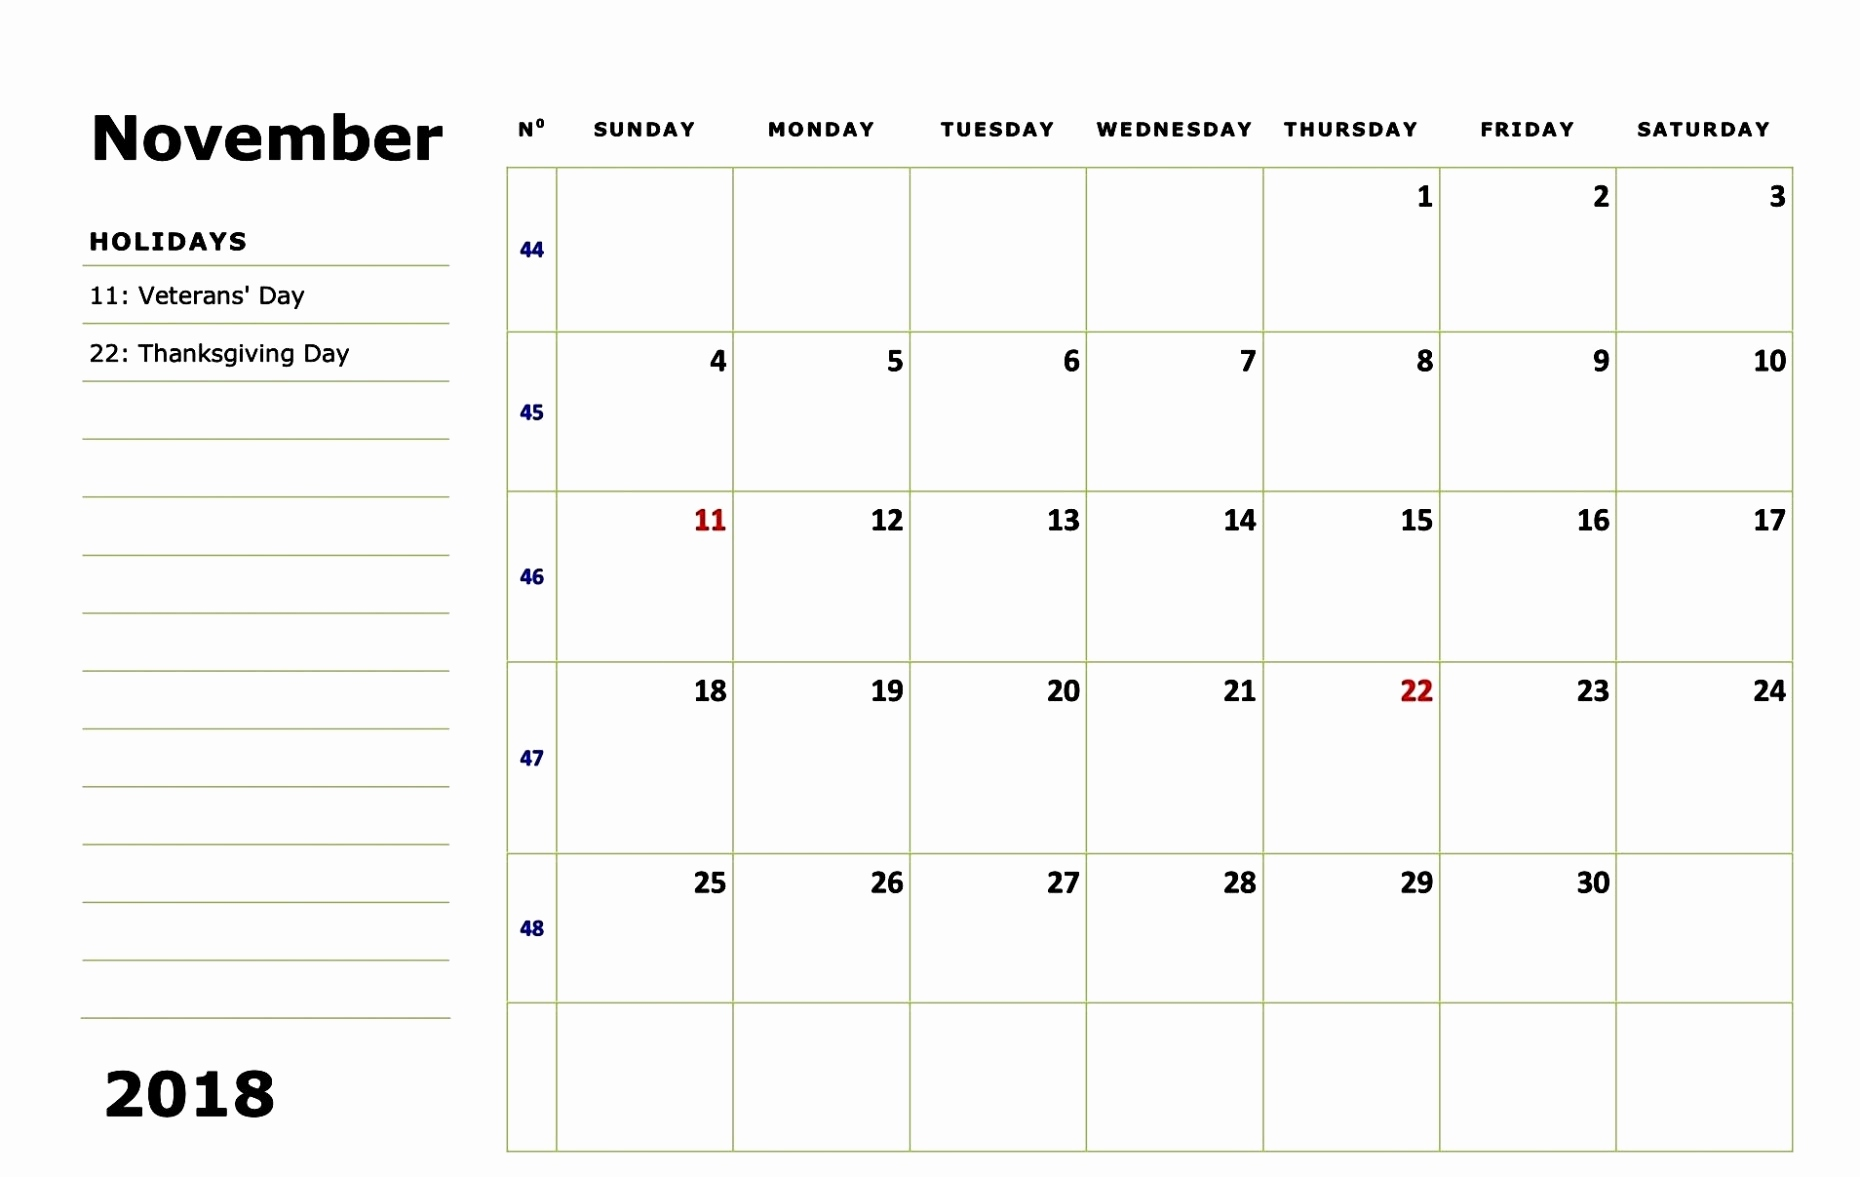 2018 November Calendar Holidays